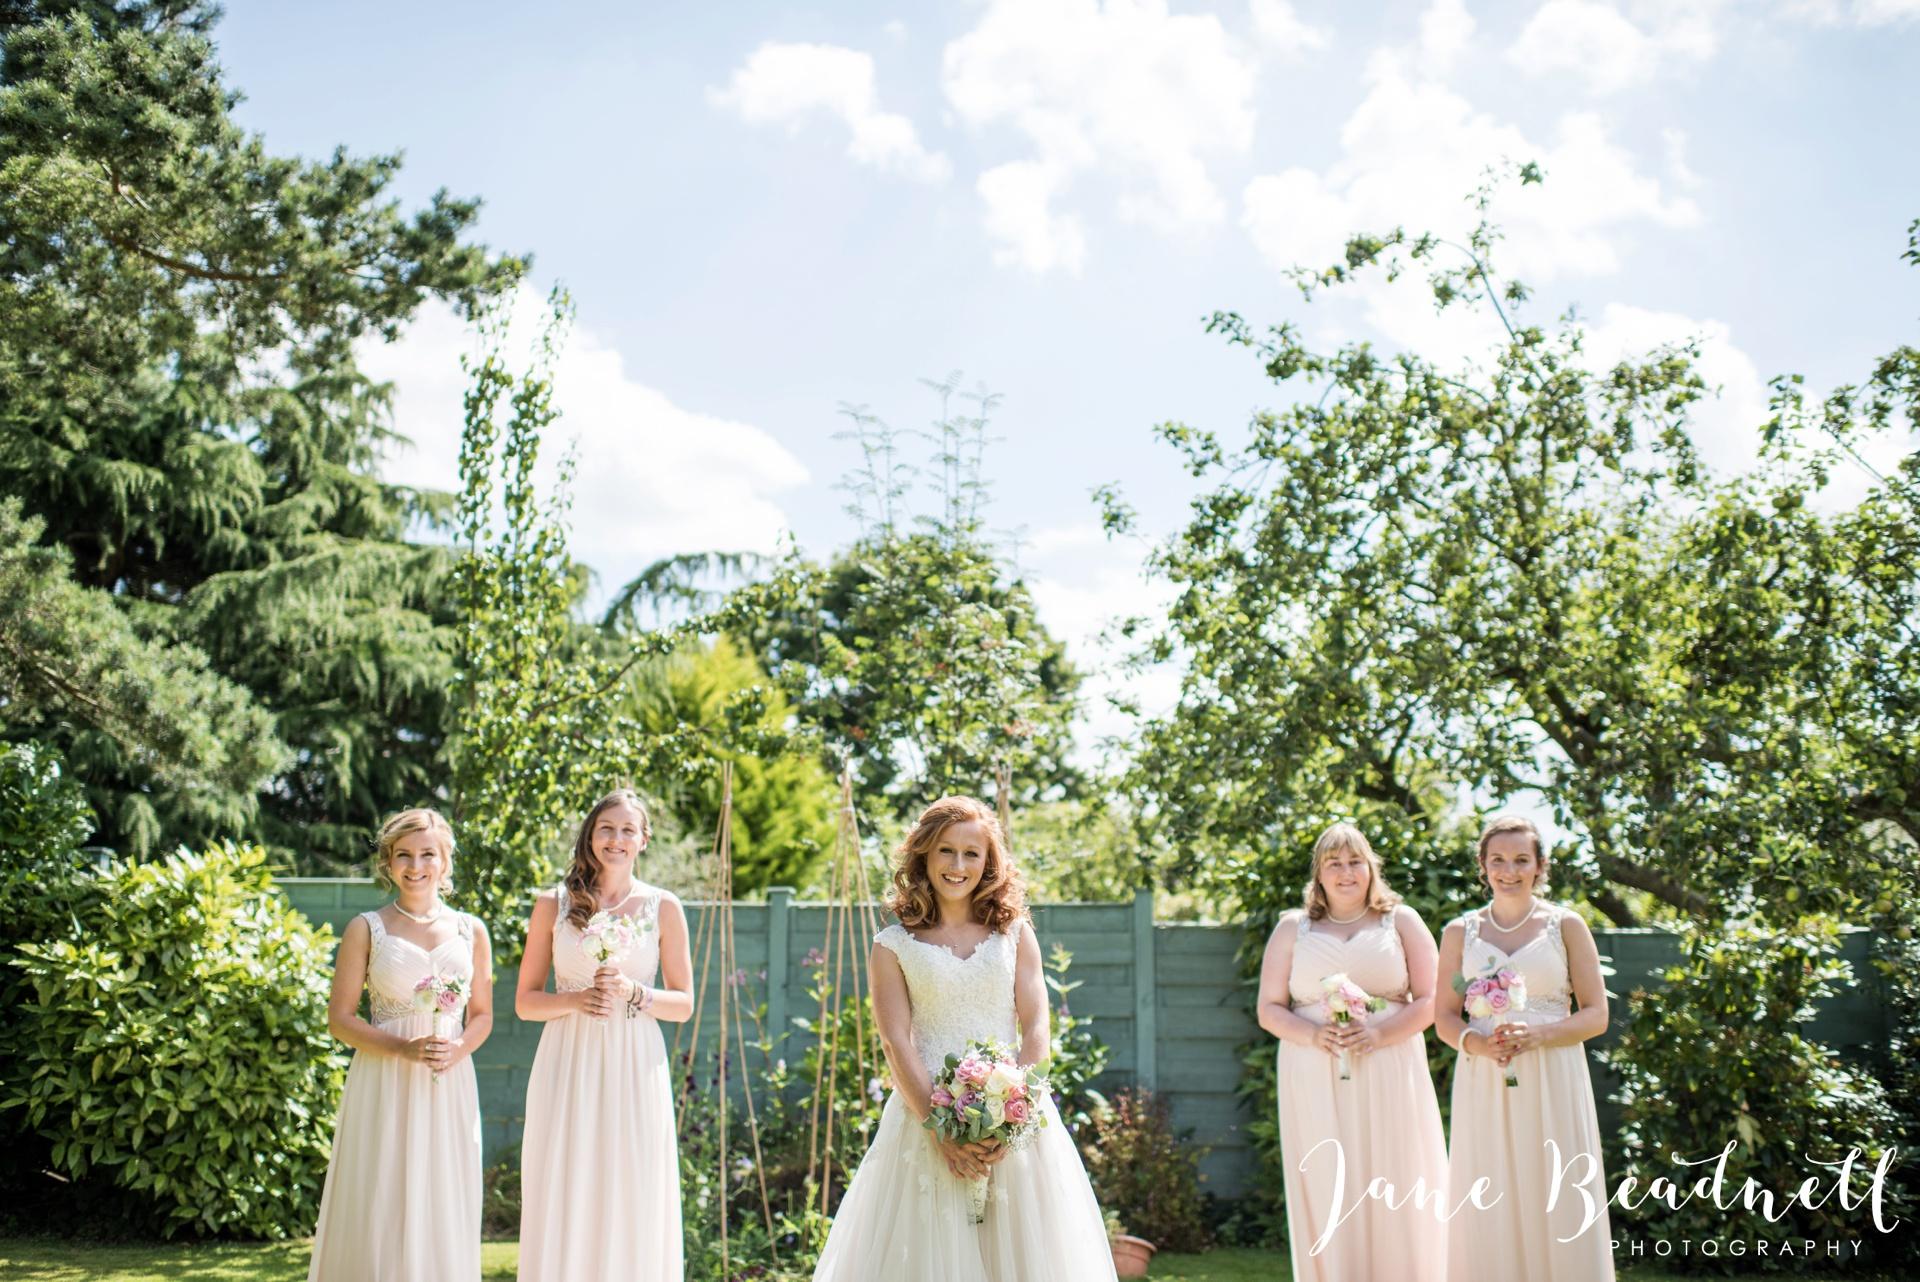 yorkshire-fine-art-wedding-photographer-jane-beadnell-photography-poppleton-york_0016